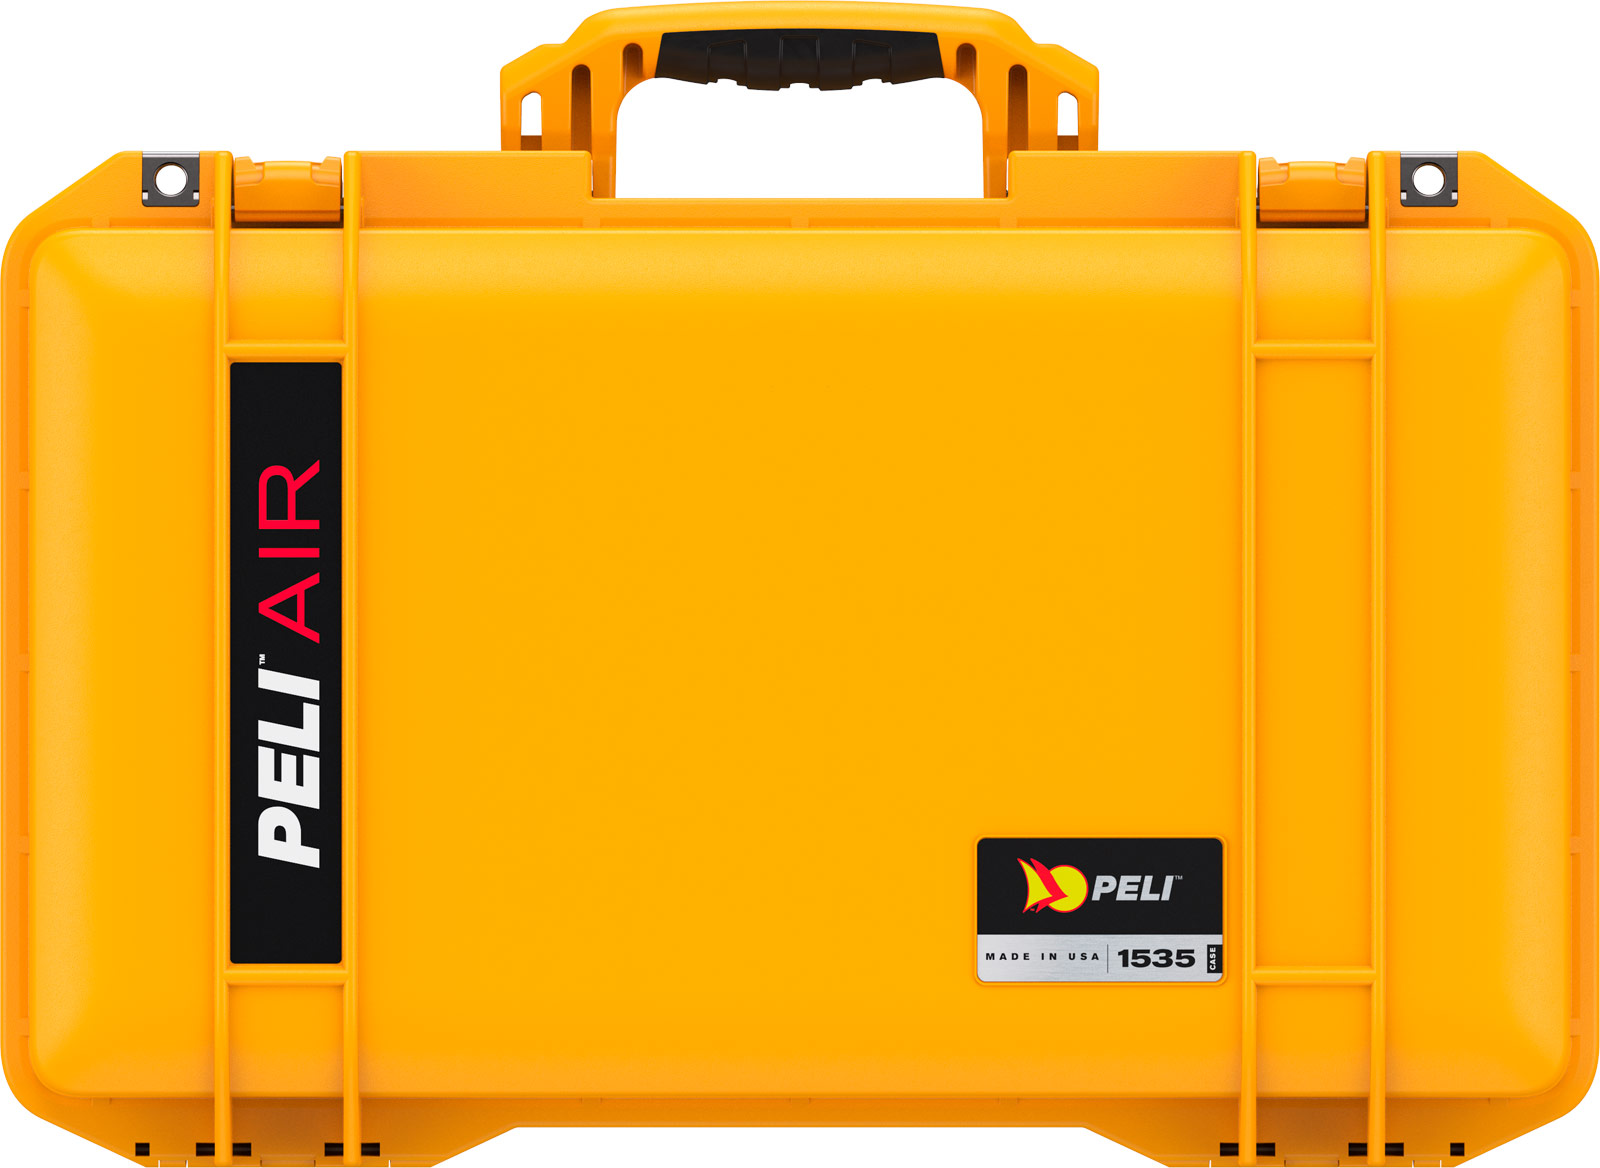 Peli Air™ 1535 - 558x355x228 - Flugschutzkoffer - Gelb